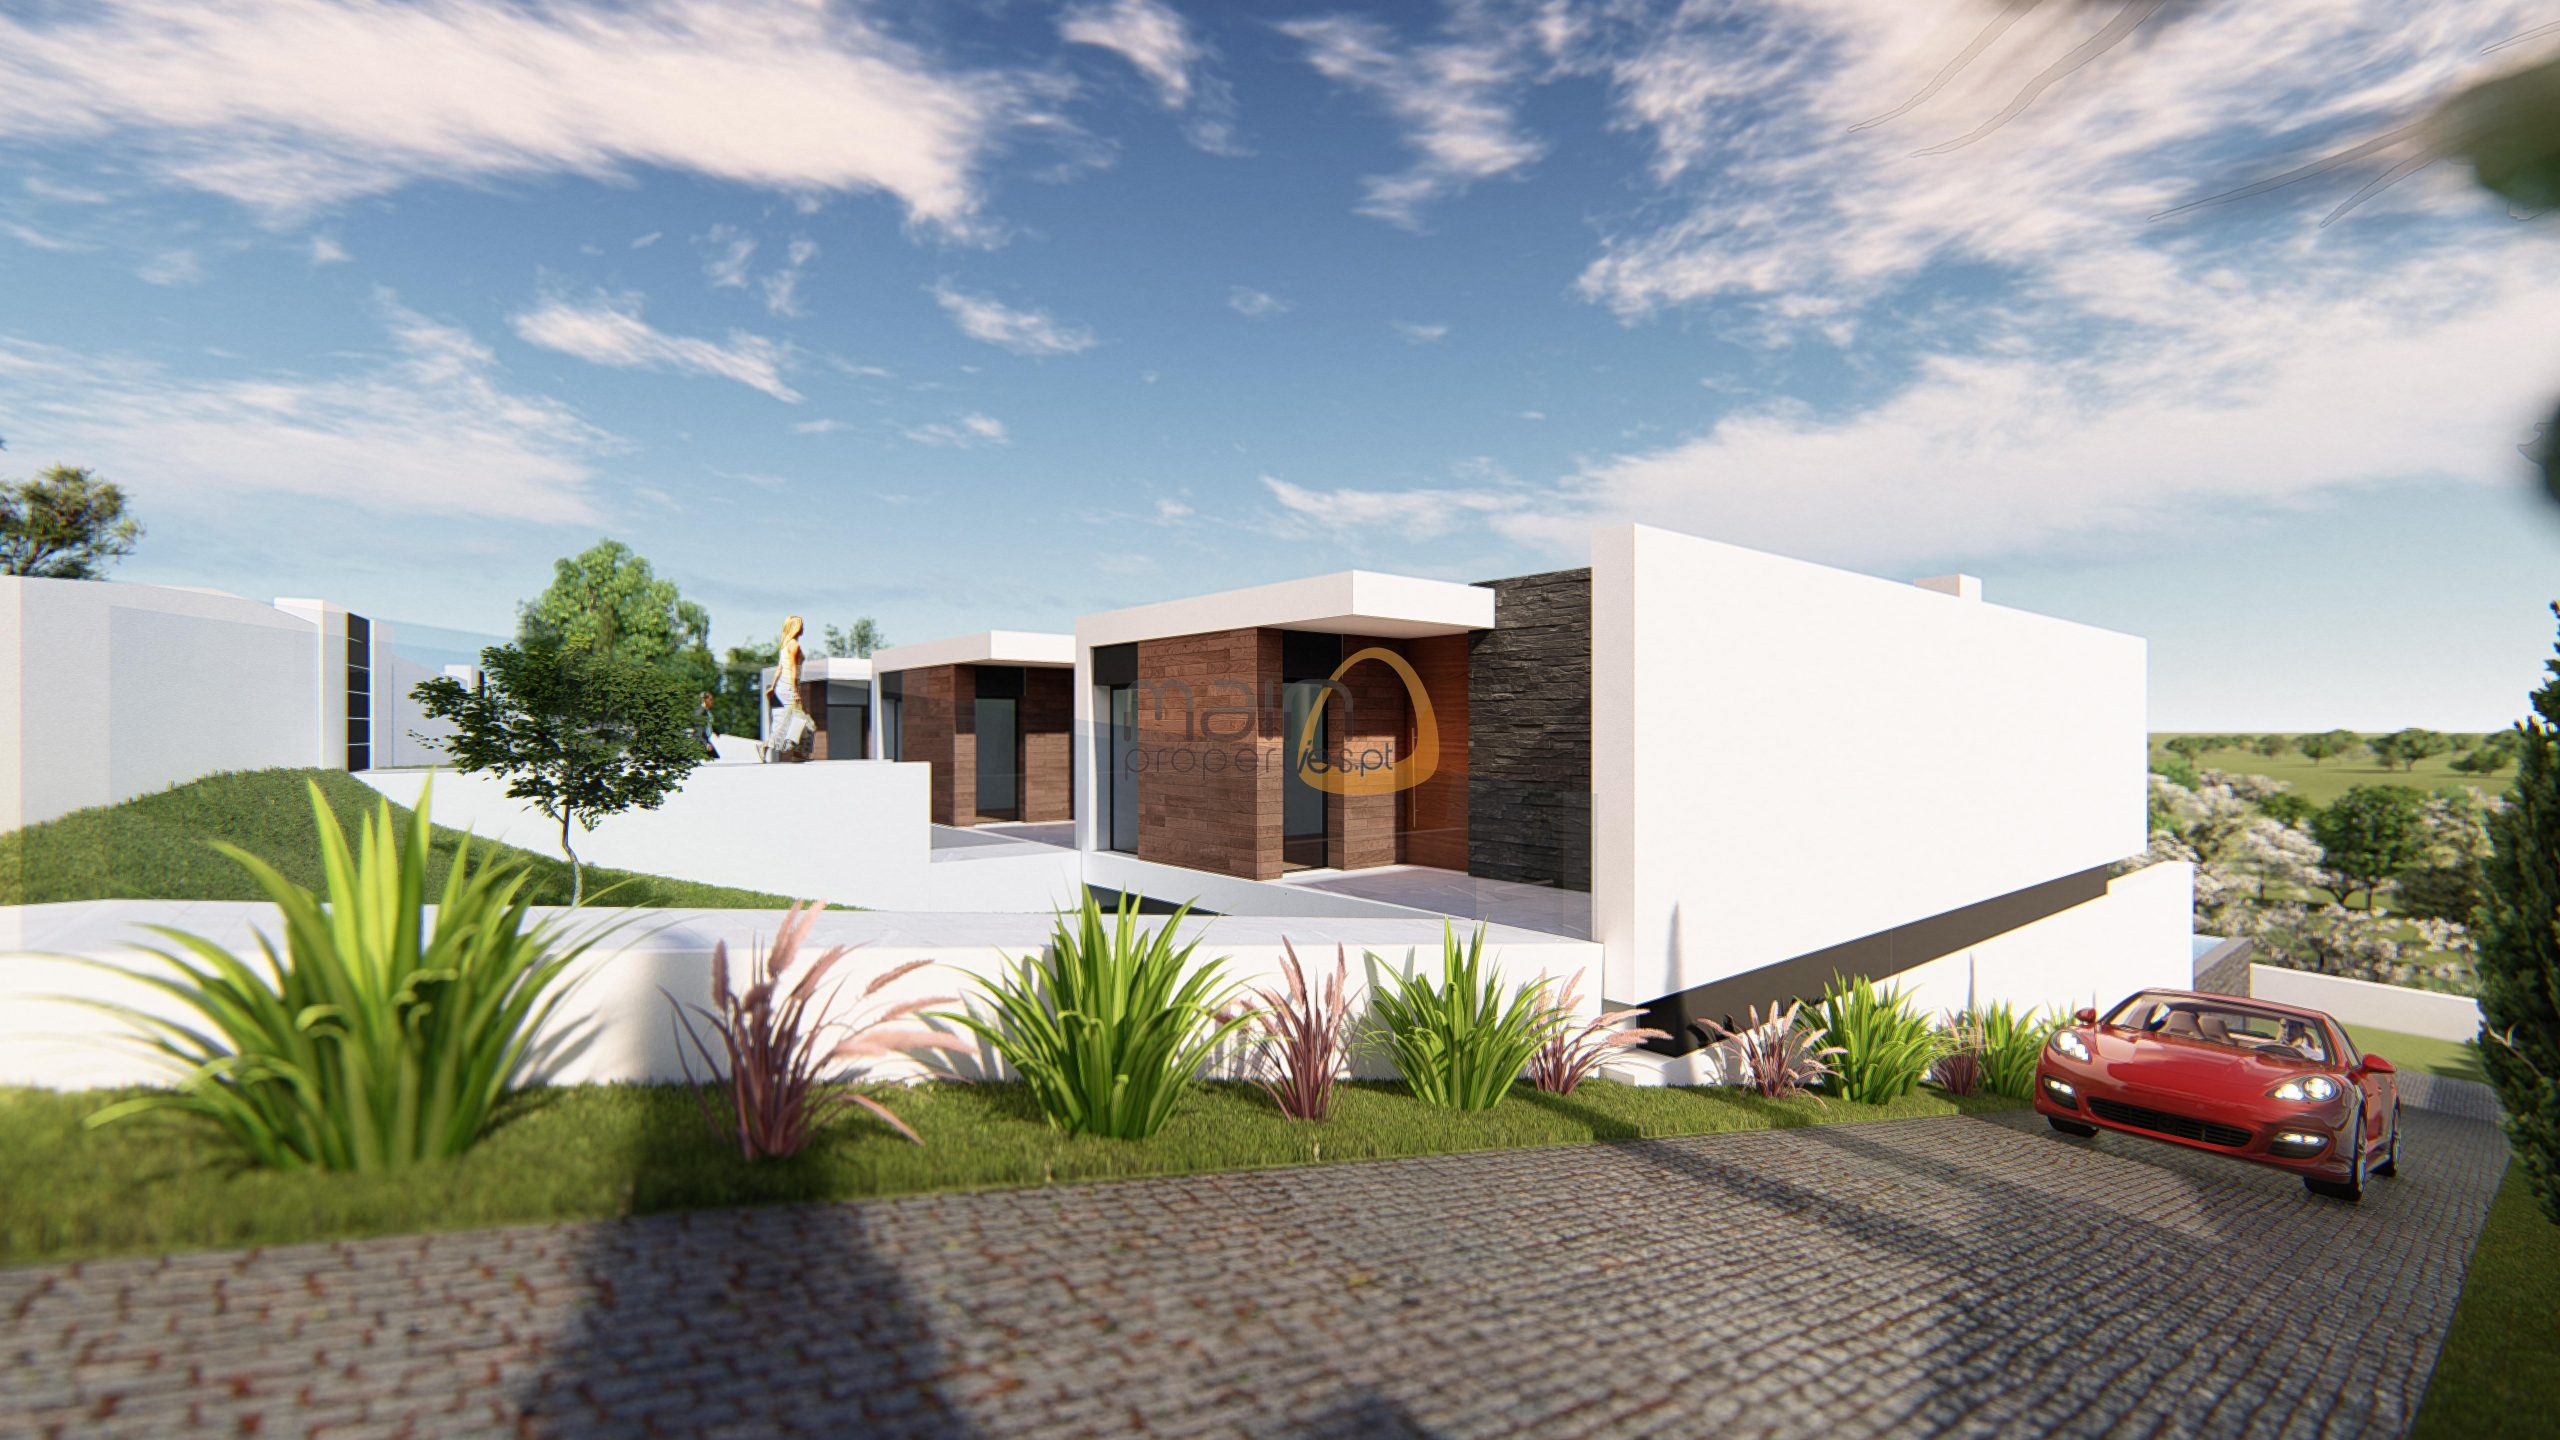 land-for-development-of-eleven-villas-with-sea-views-in-almancil-algarve-portugal-property-real-estate-03